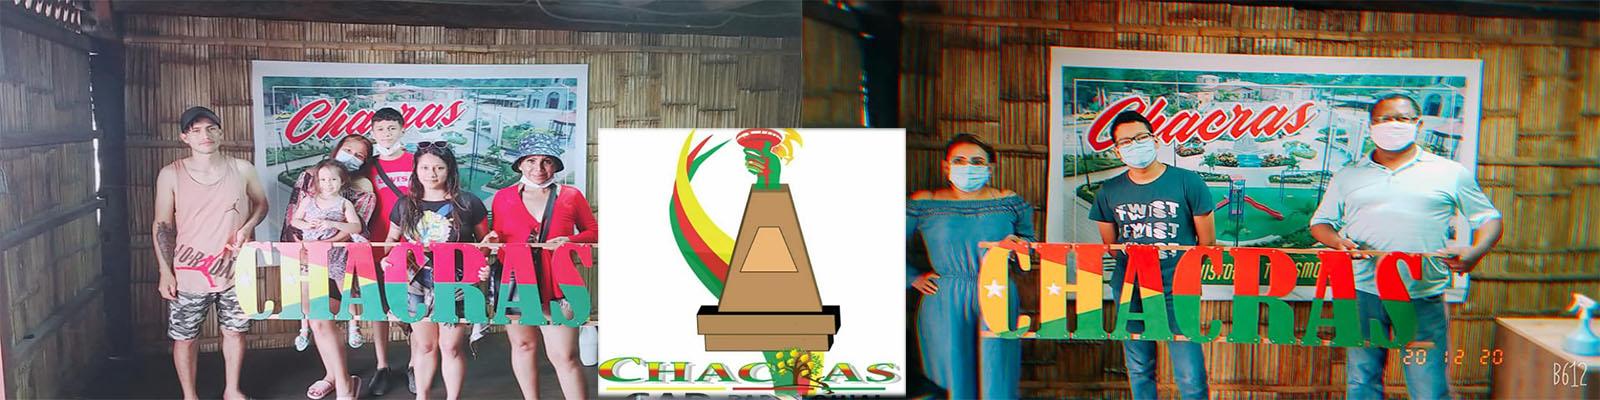 CHACRAS1.jpg